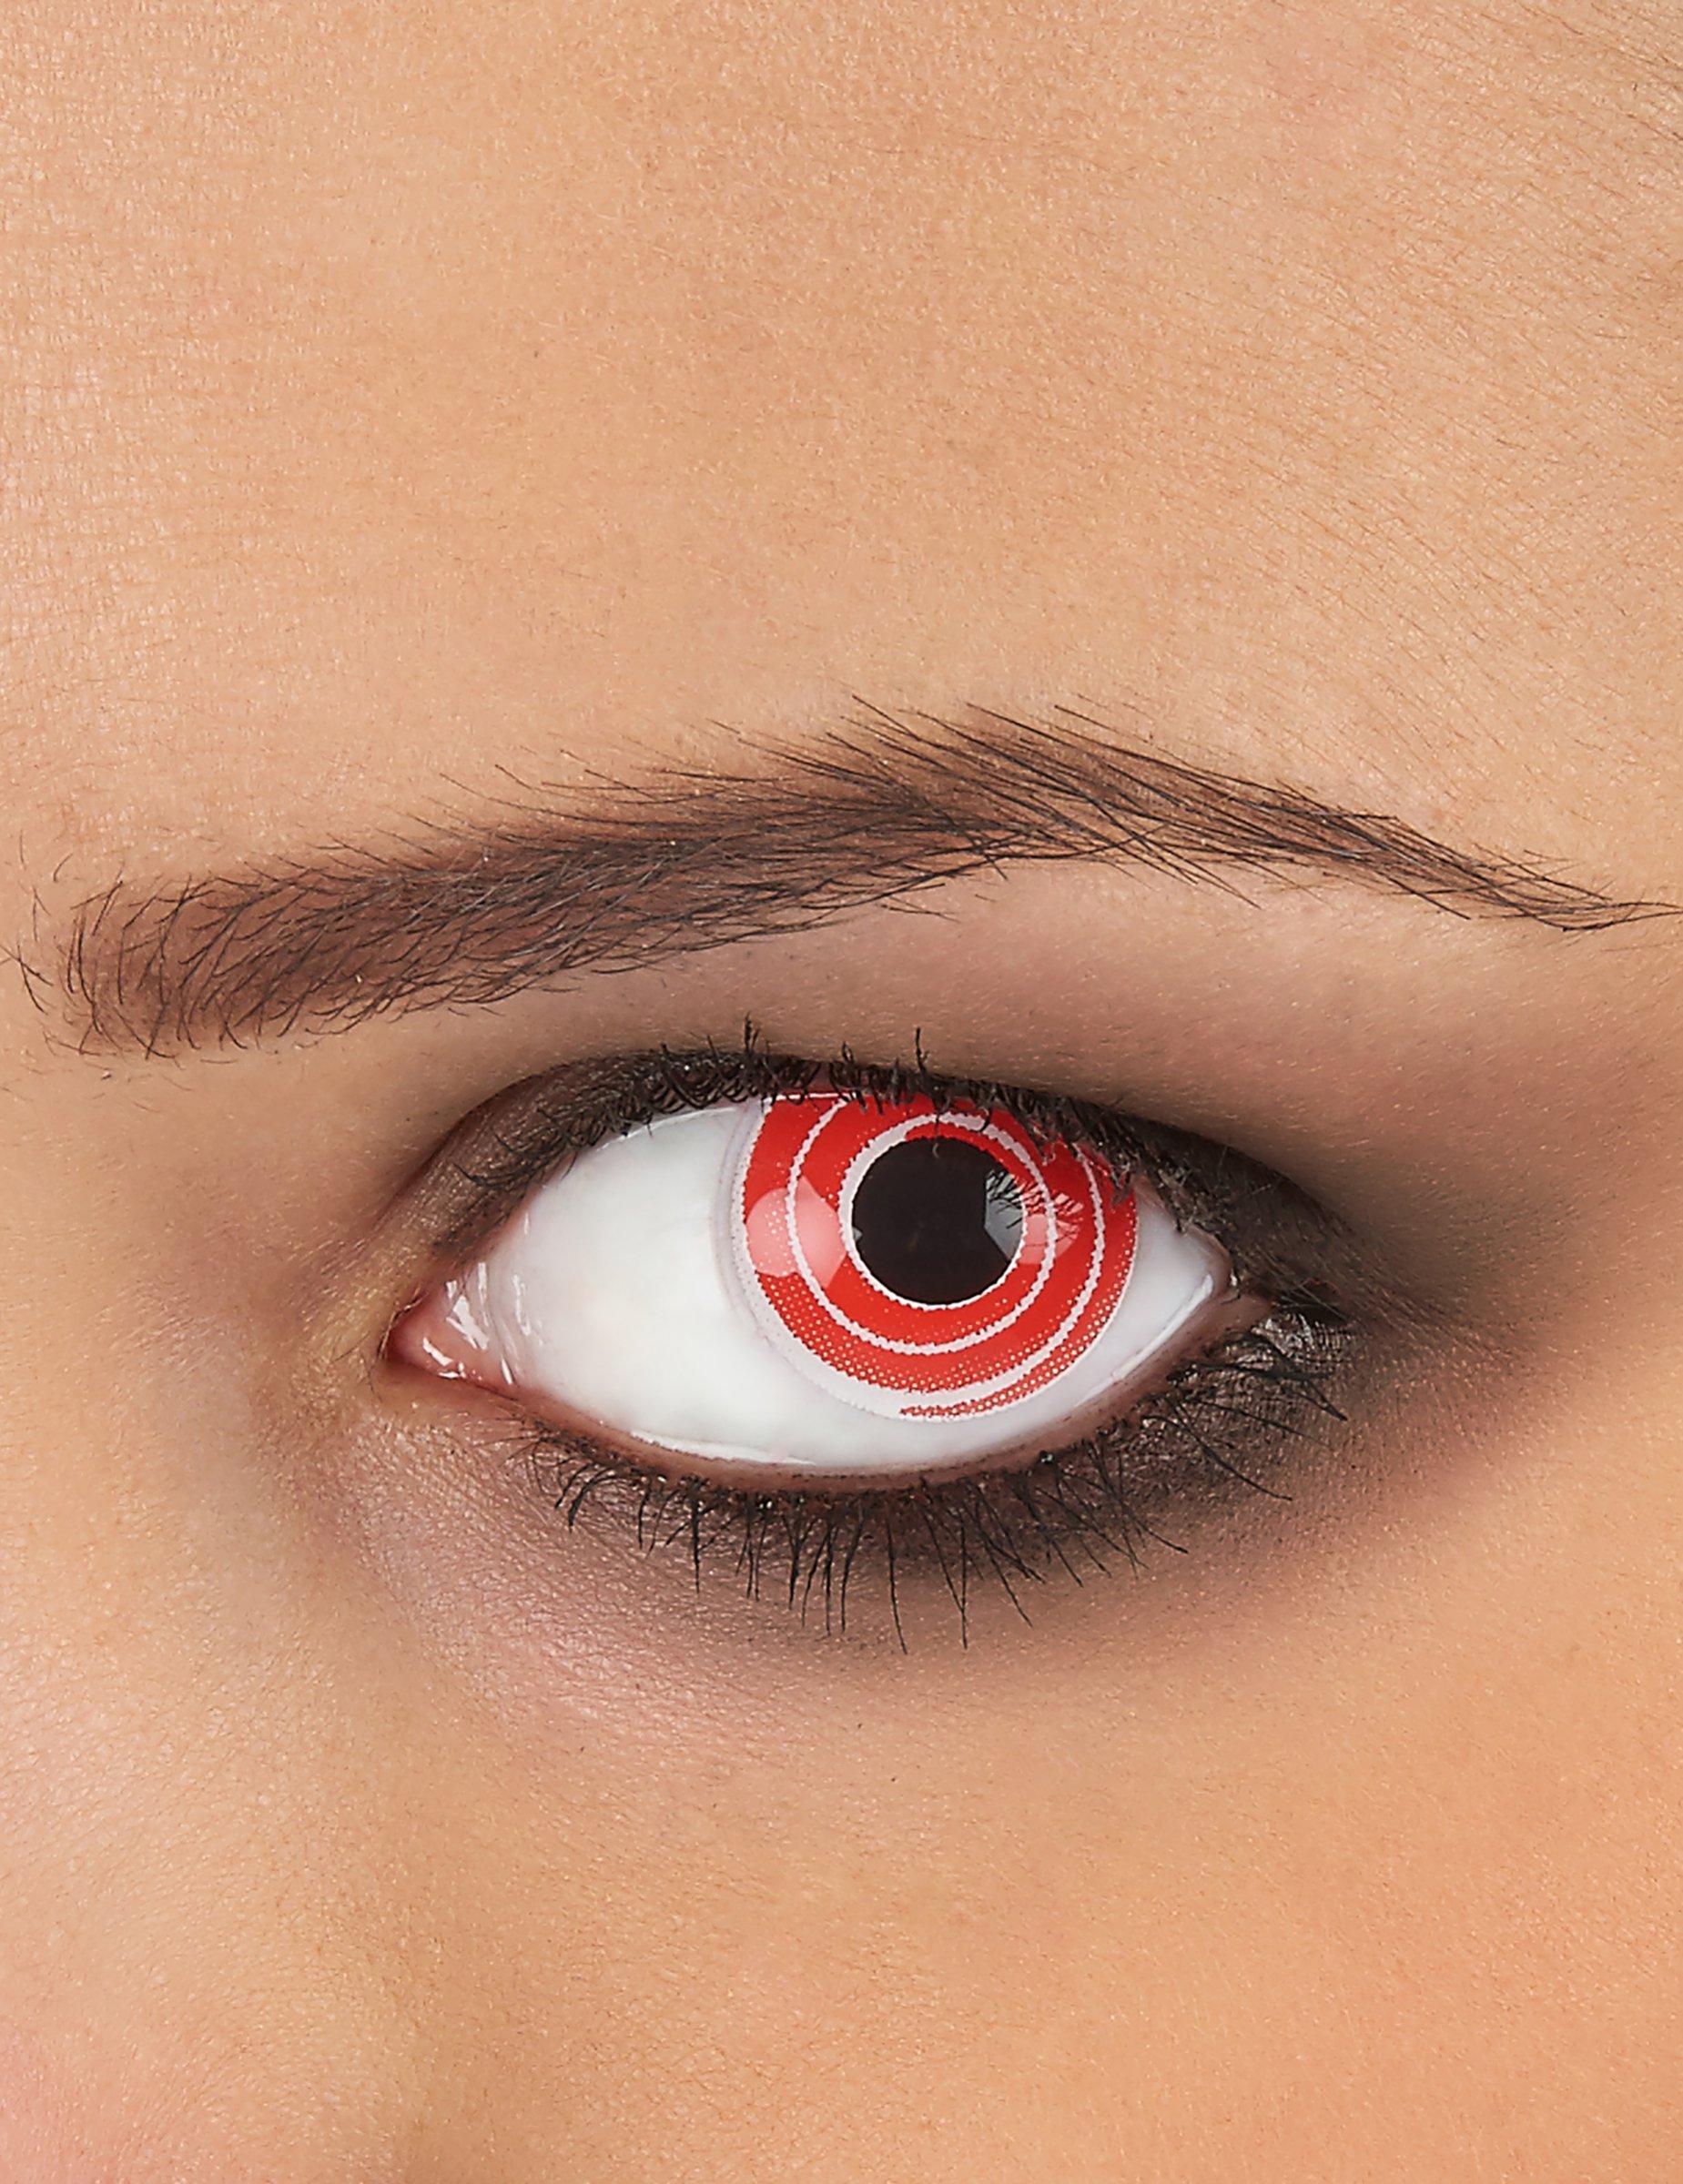 originelle kontaktlinsen rot wei e spirale schminke und. Black Bedroom Furniture Sets. Home Design Ideas